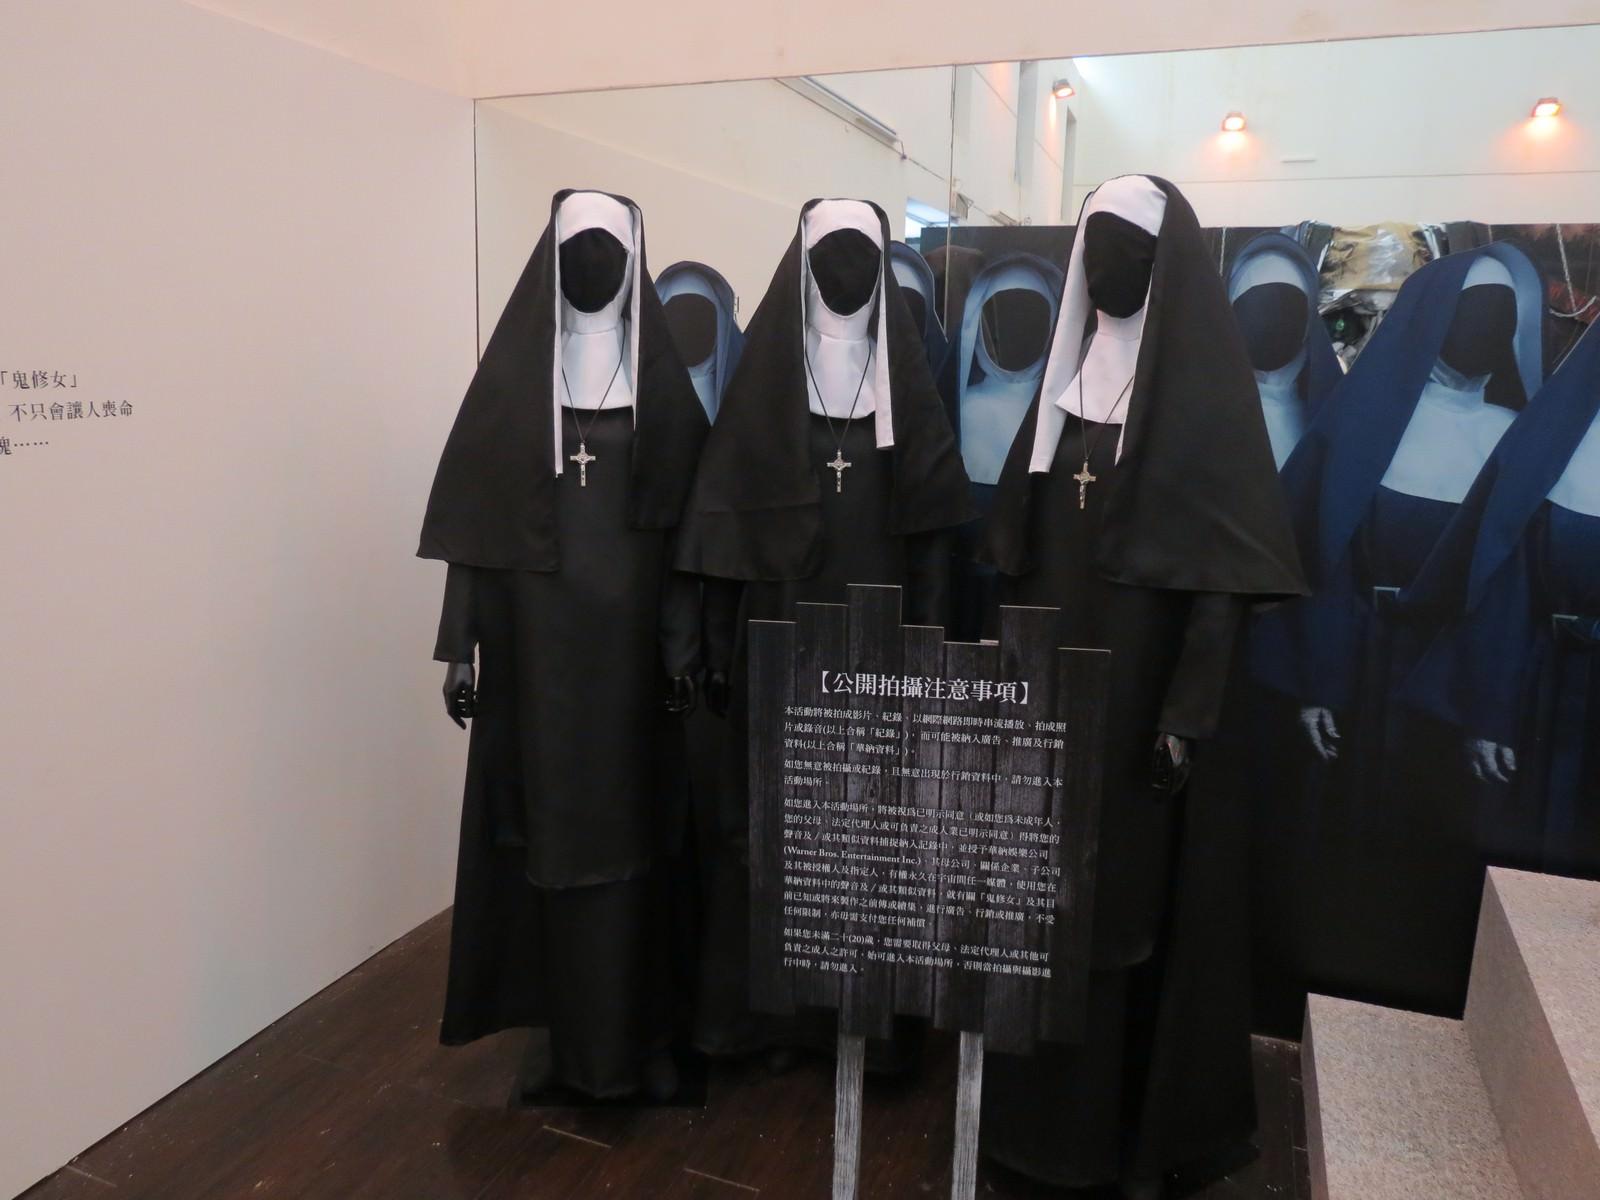 Movie, The Nun(美國, 2018) / 鬼修女(台) / 詭修女(港) / 修女(網), 廣告看板, 臺北市電影主題公園